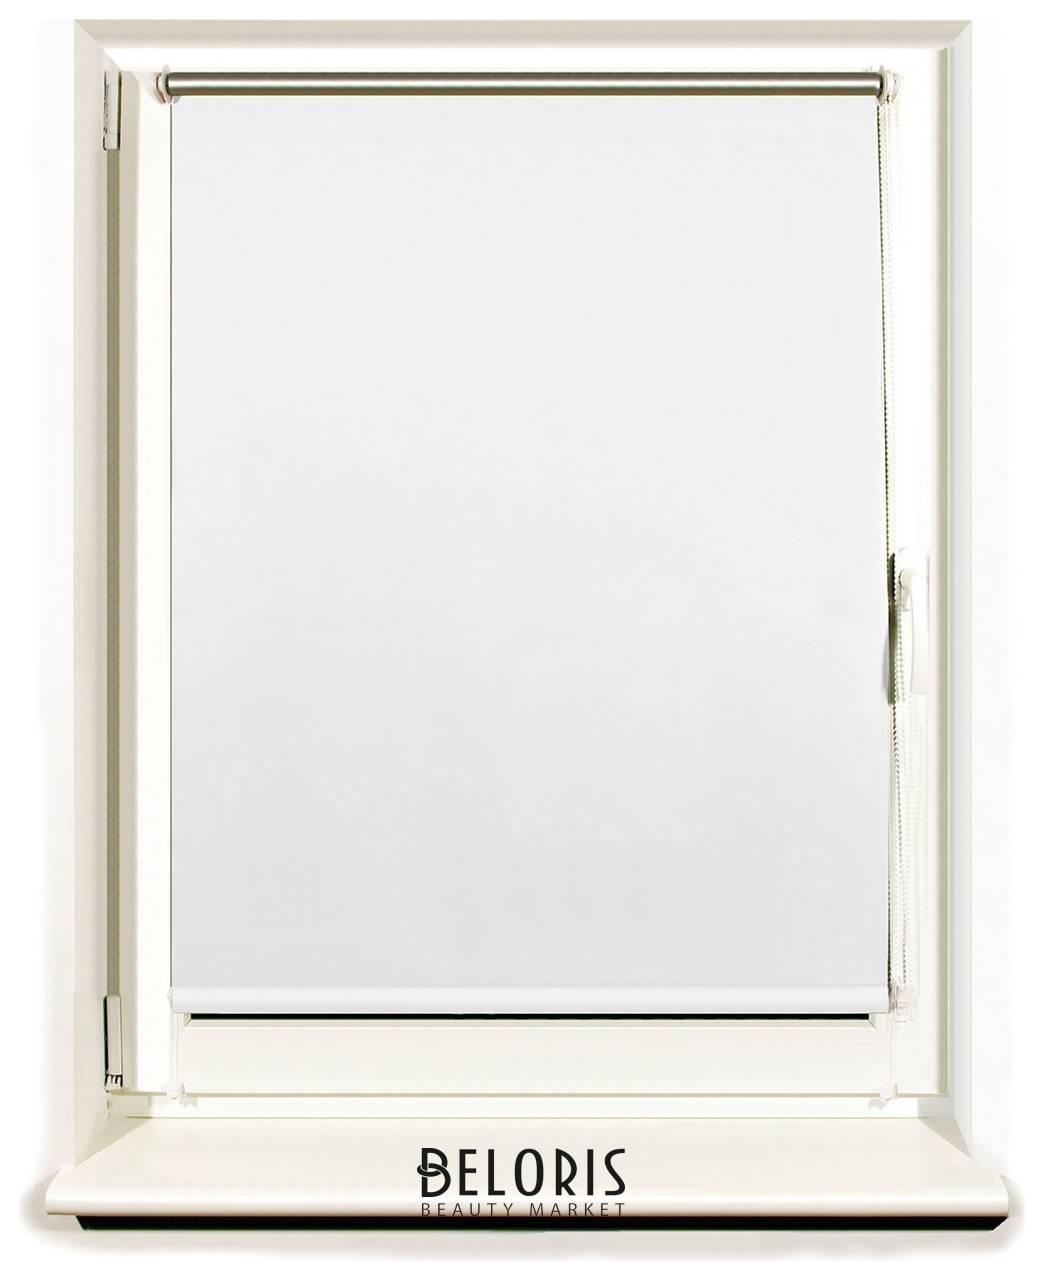 Штора рулонная светонепроницаемая (Блэкаут) Brabix 120х175 см, белый/серебро Brabix